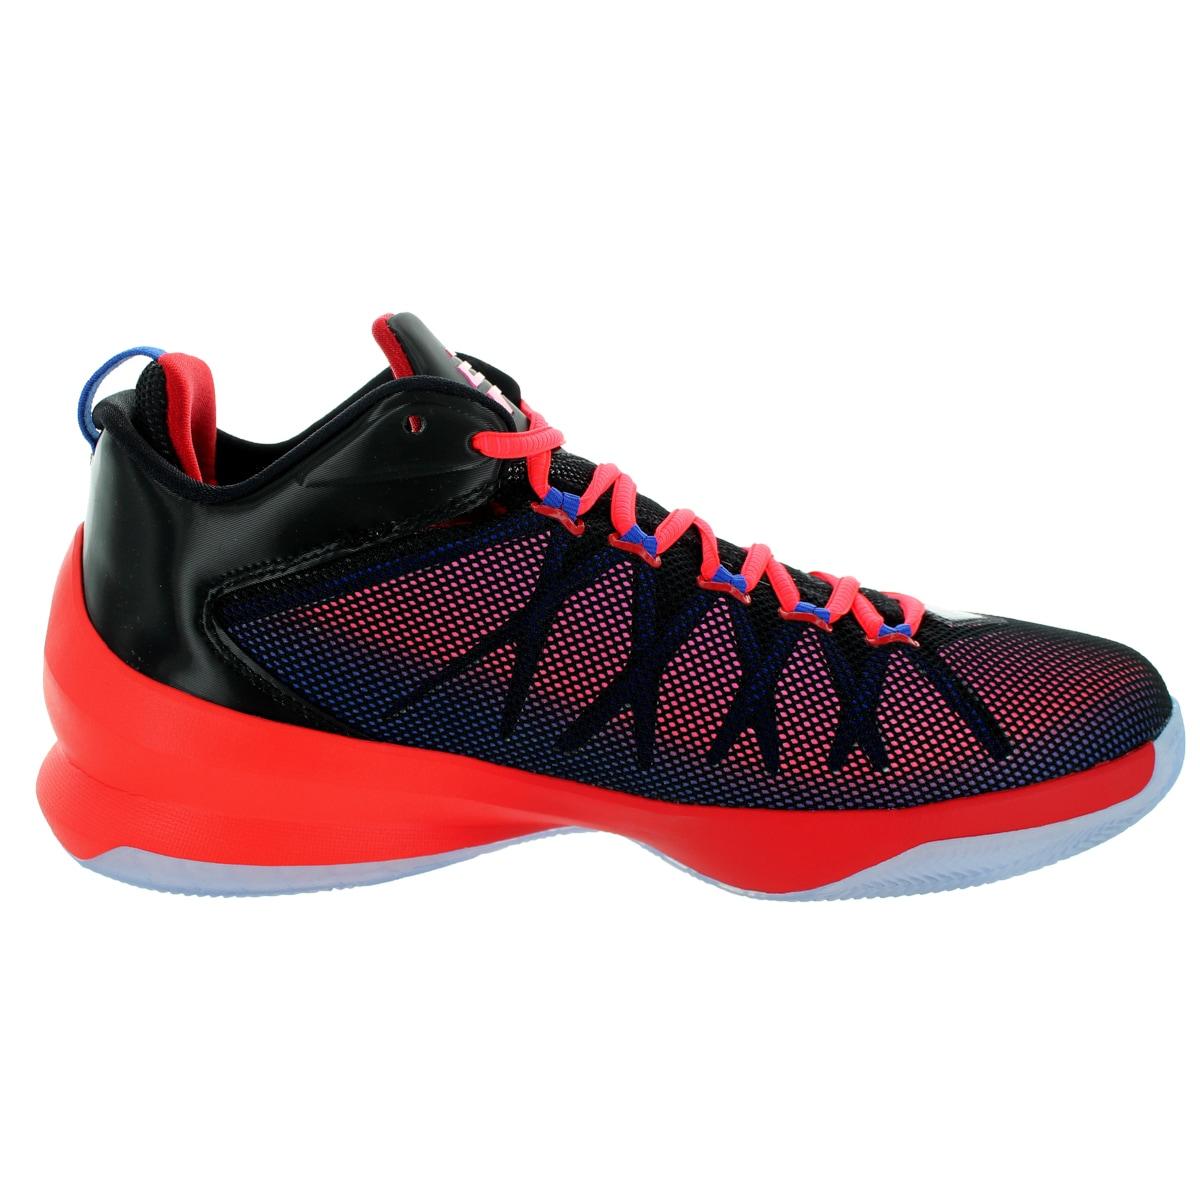 1f2ca010077f Shop Nike Jordan Men s Jordan Cp3.Viii Ae Black Gm Royal Sprt Rd Pink Pw Basketball  Shoe - Free Shipping Today - Overstock.com - 12318472